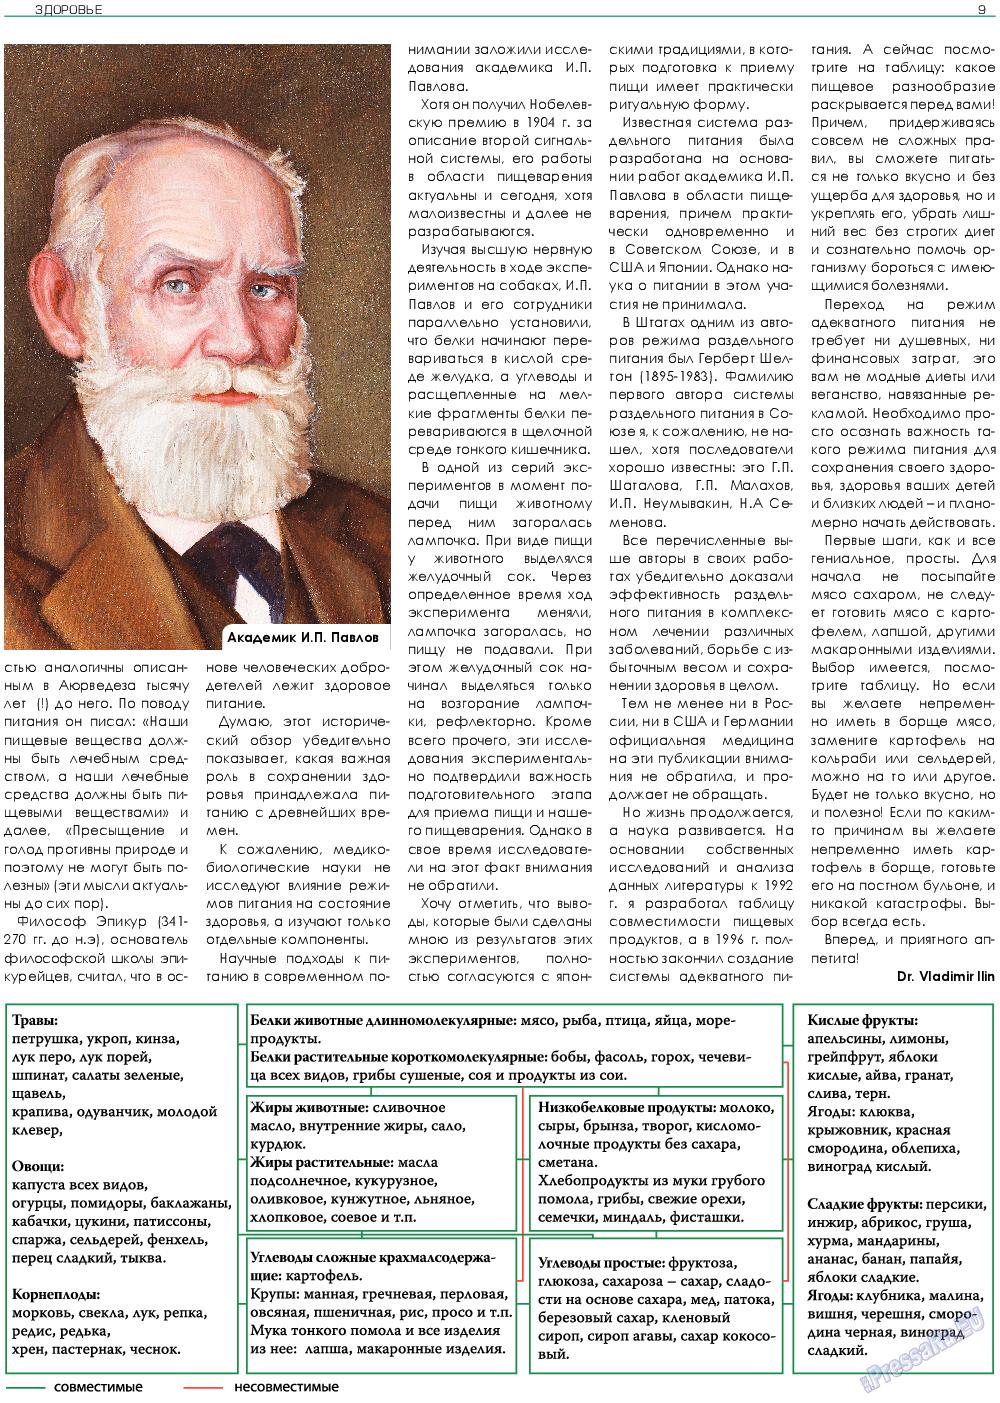 Здоровье (газета). 2019 год, номер 10, стр. 9